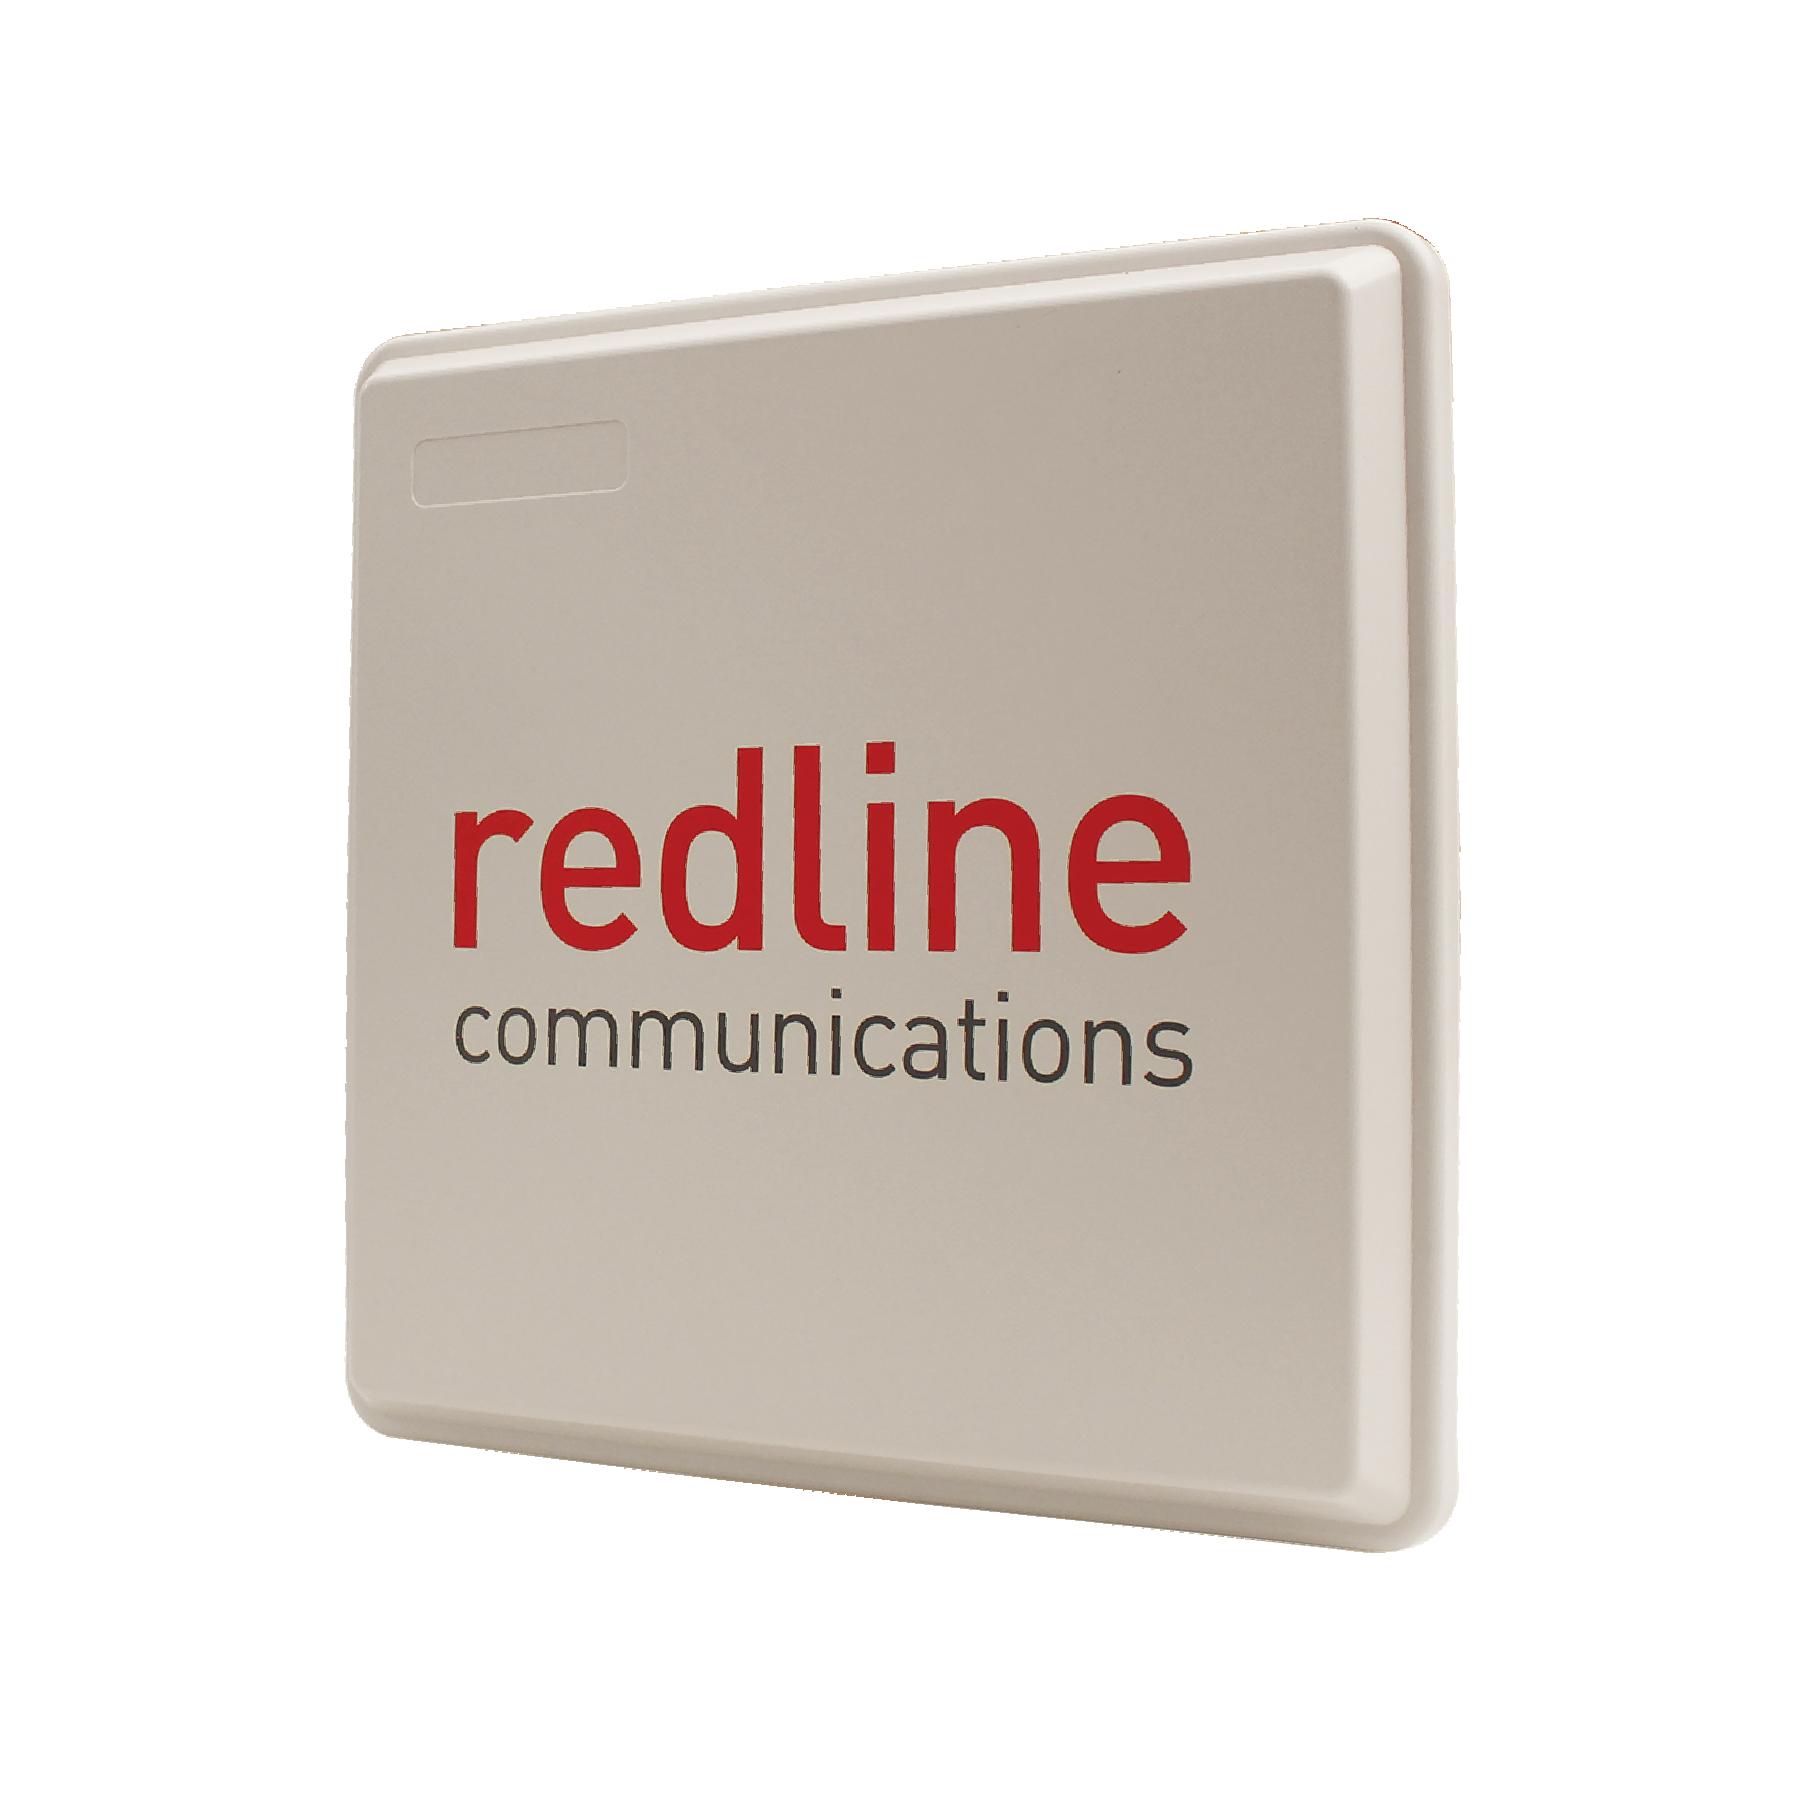 Redline RDL 3100 XG Elte XR RGB 2